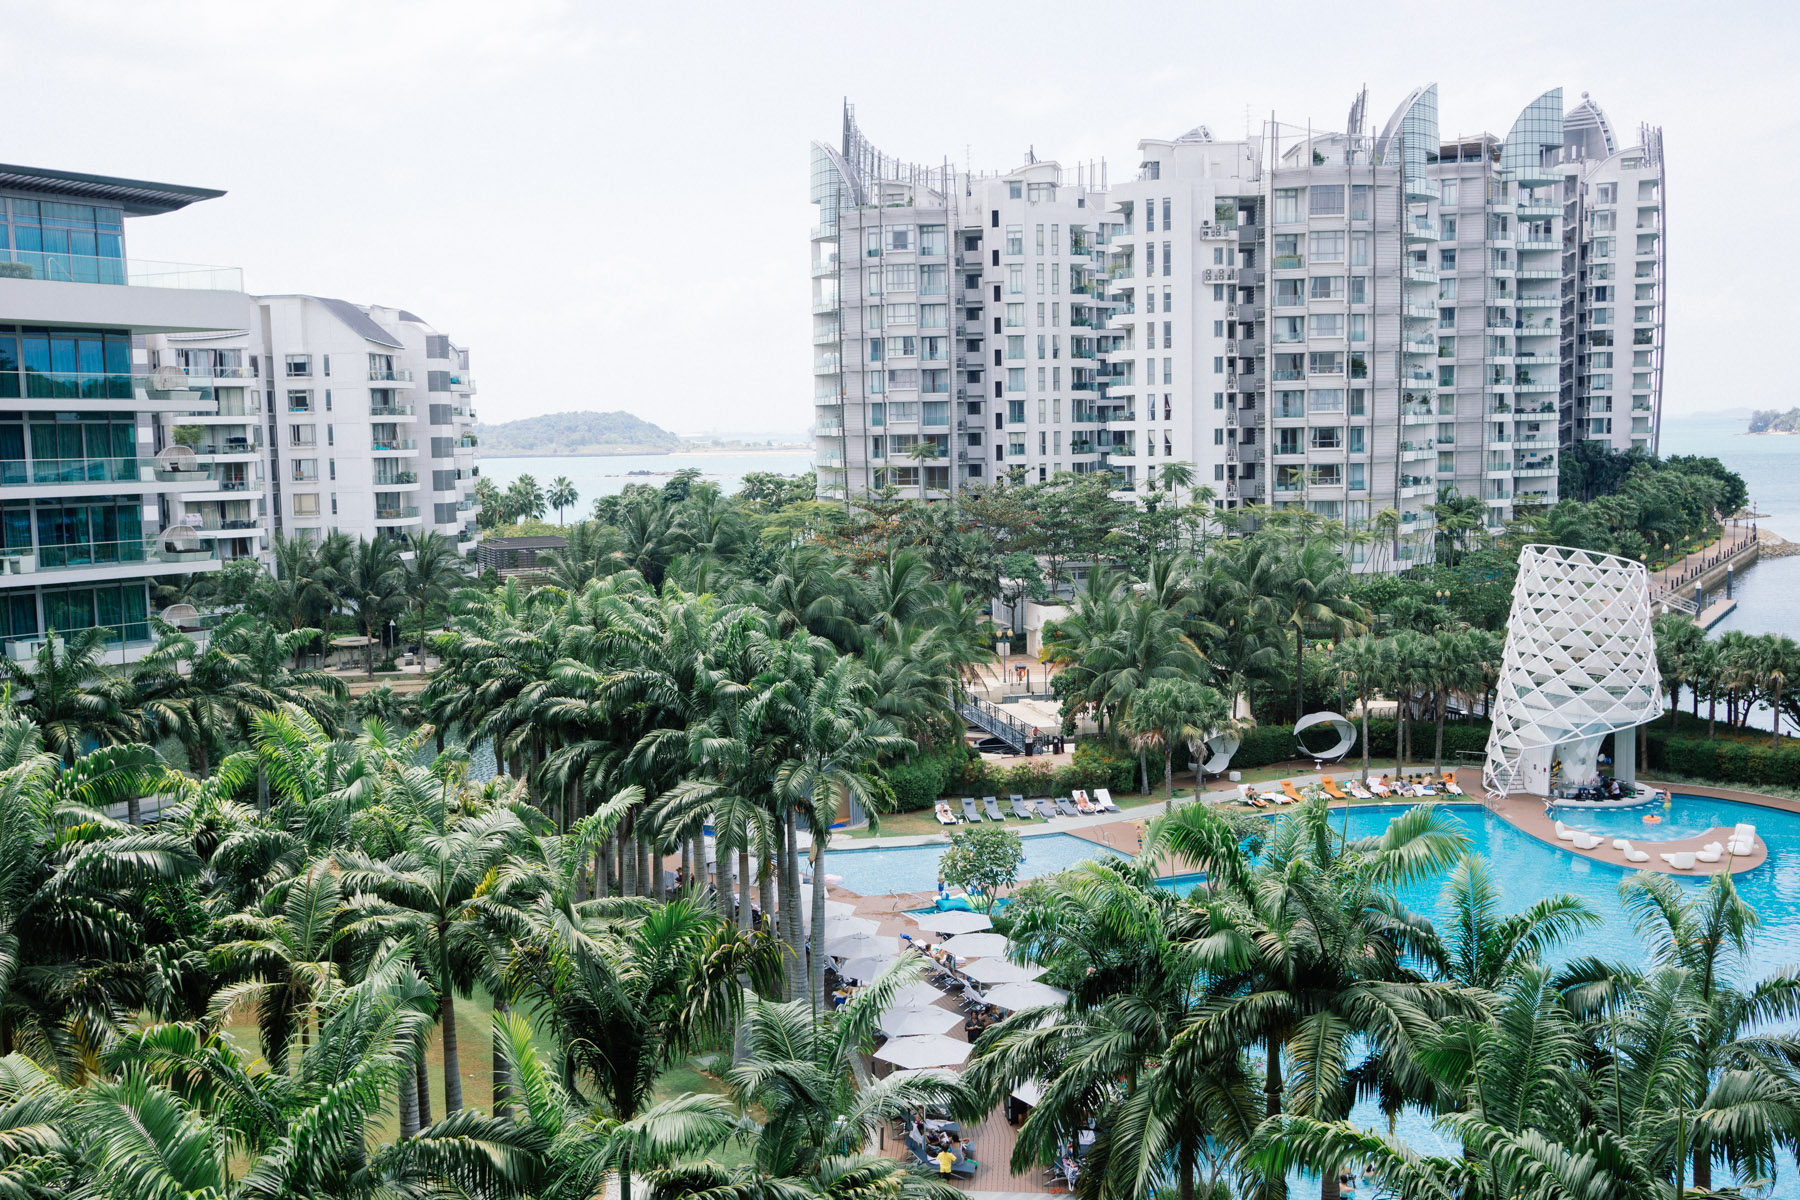 Sentosa casino singapore location